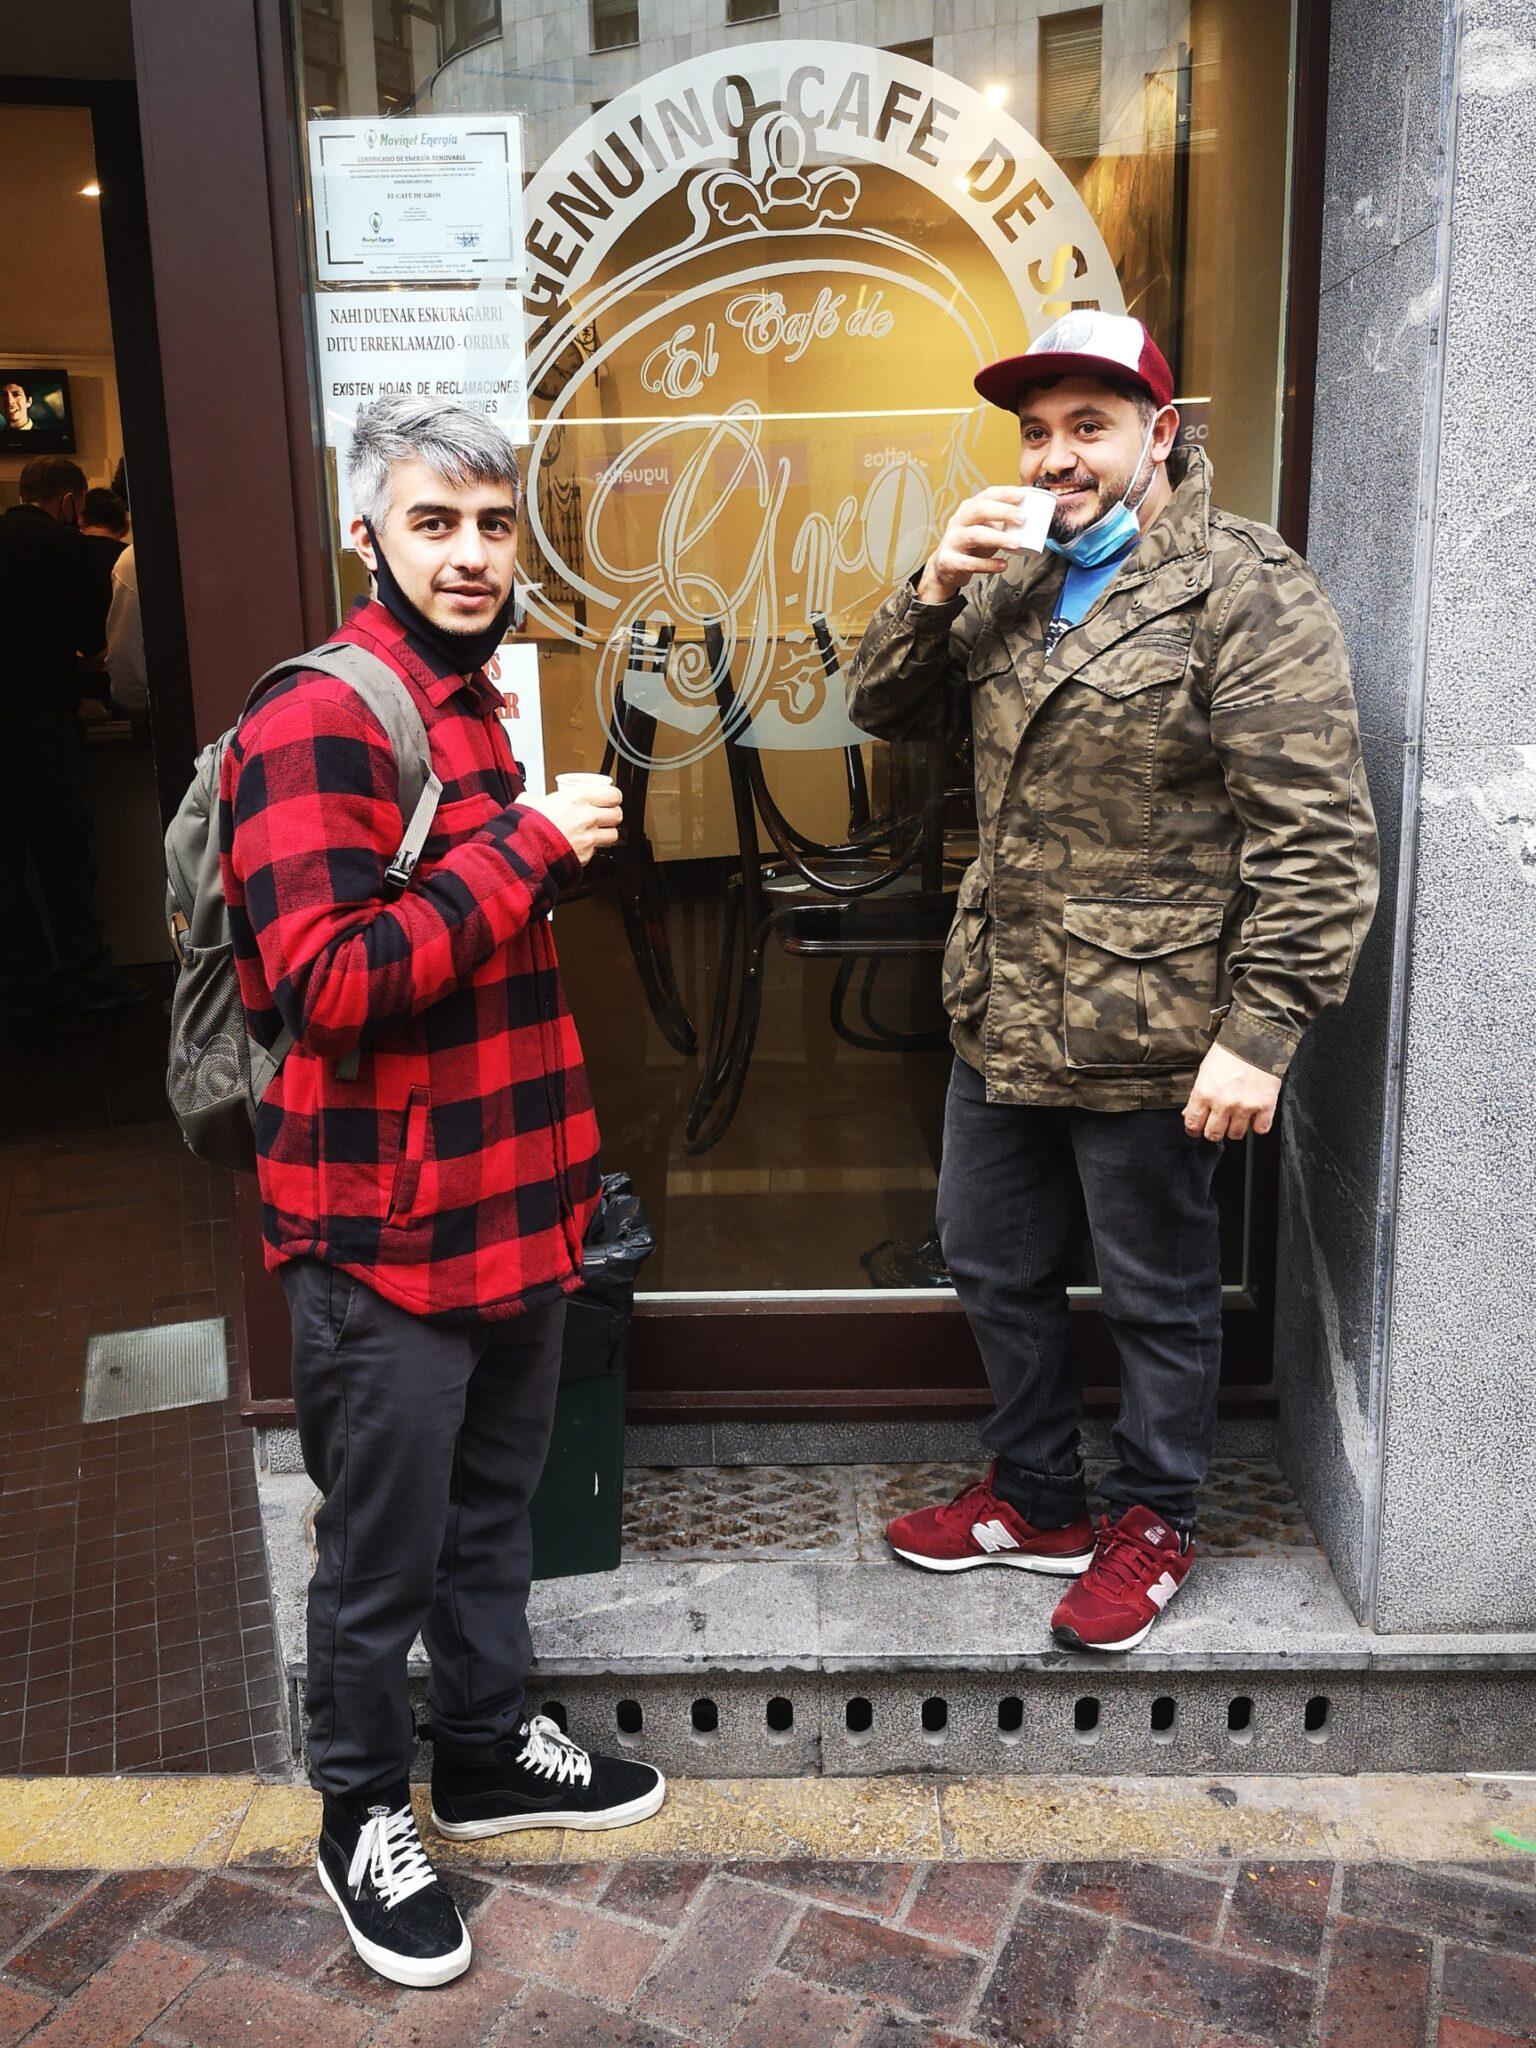 Clientes Cafe De Gros scaled - Donostia, ahora, se recorre café en mano